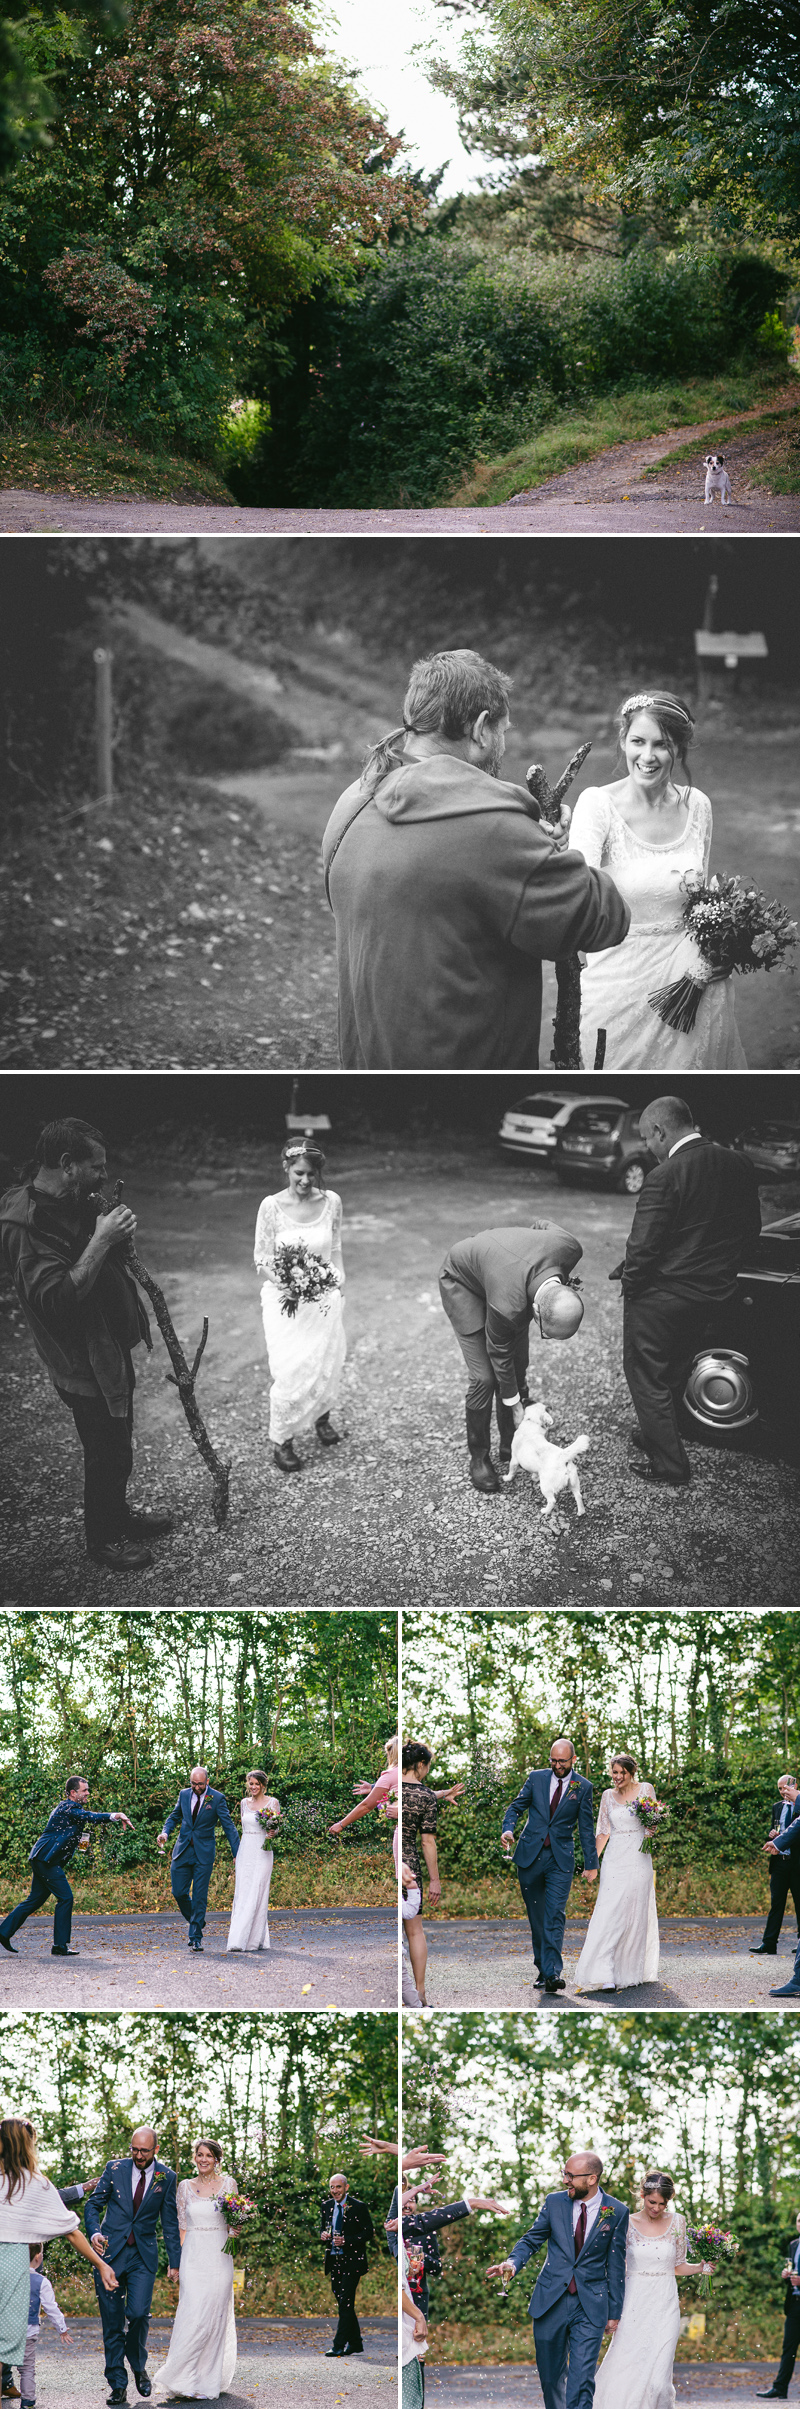 documentary wedding photos